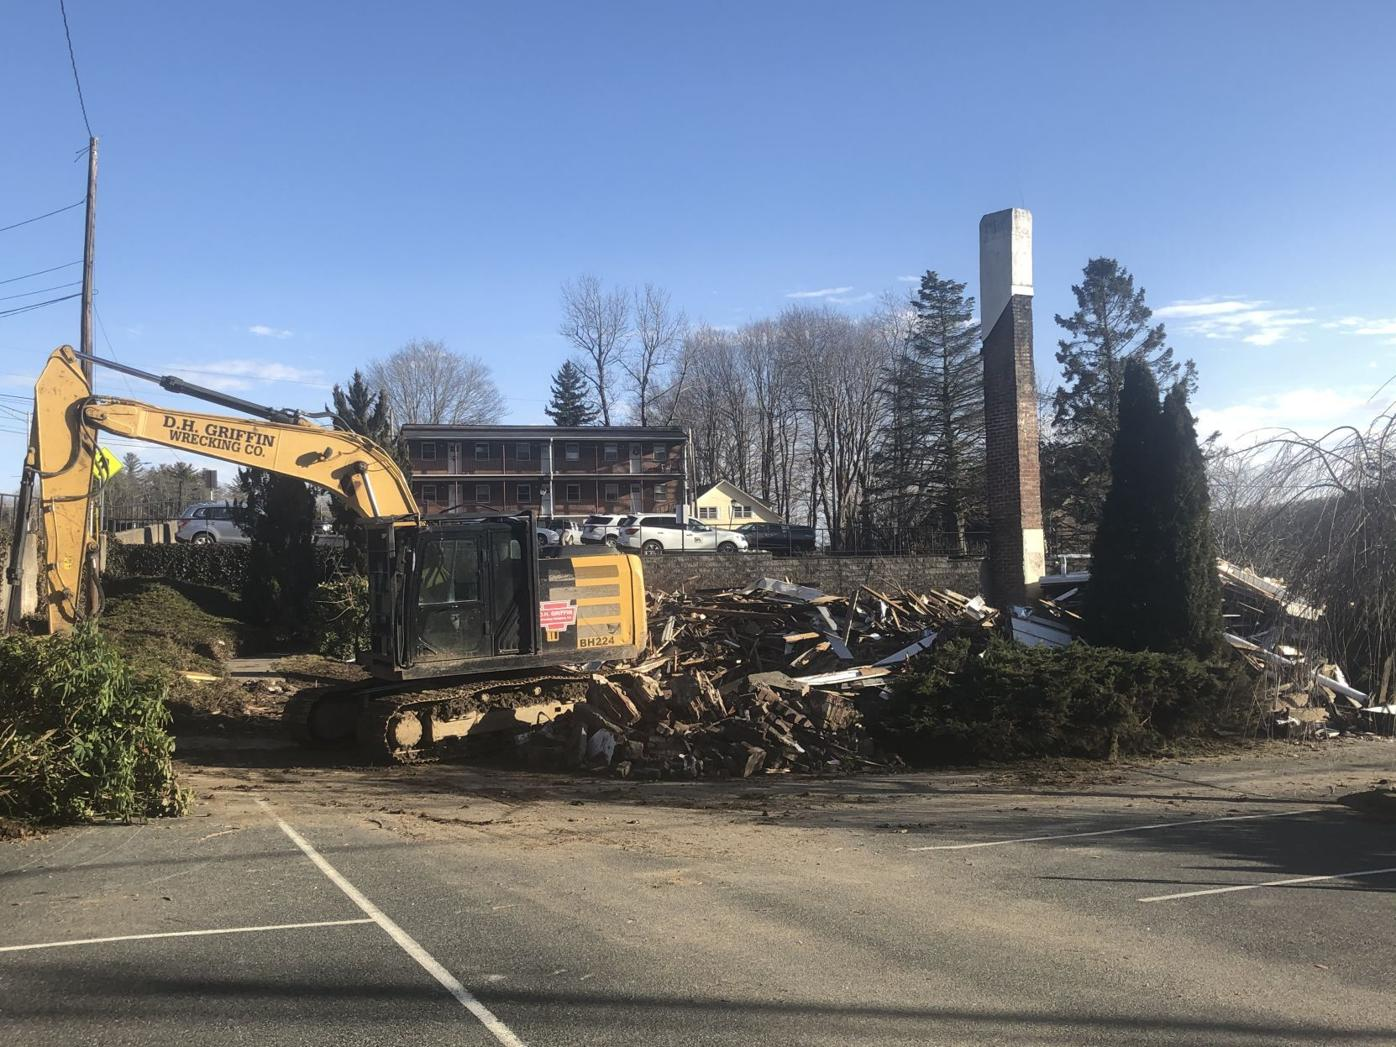 Turn House demolition